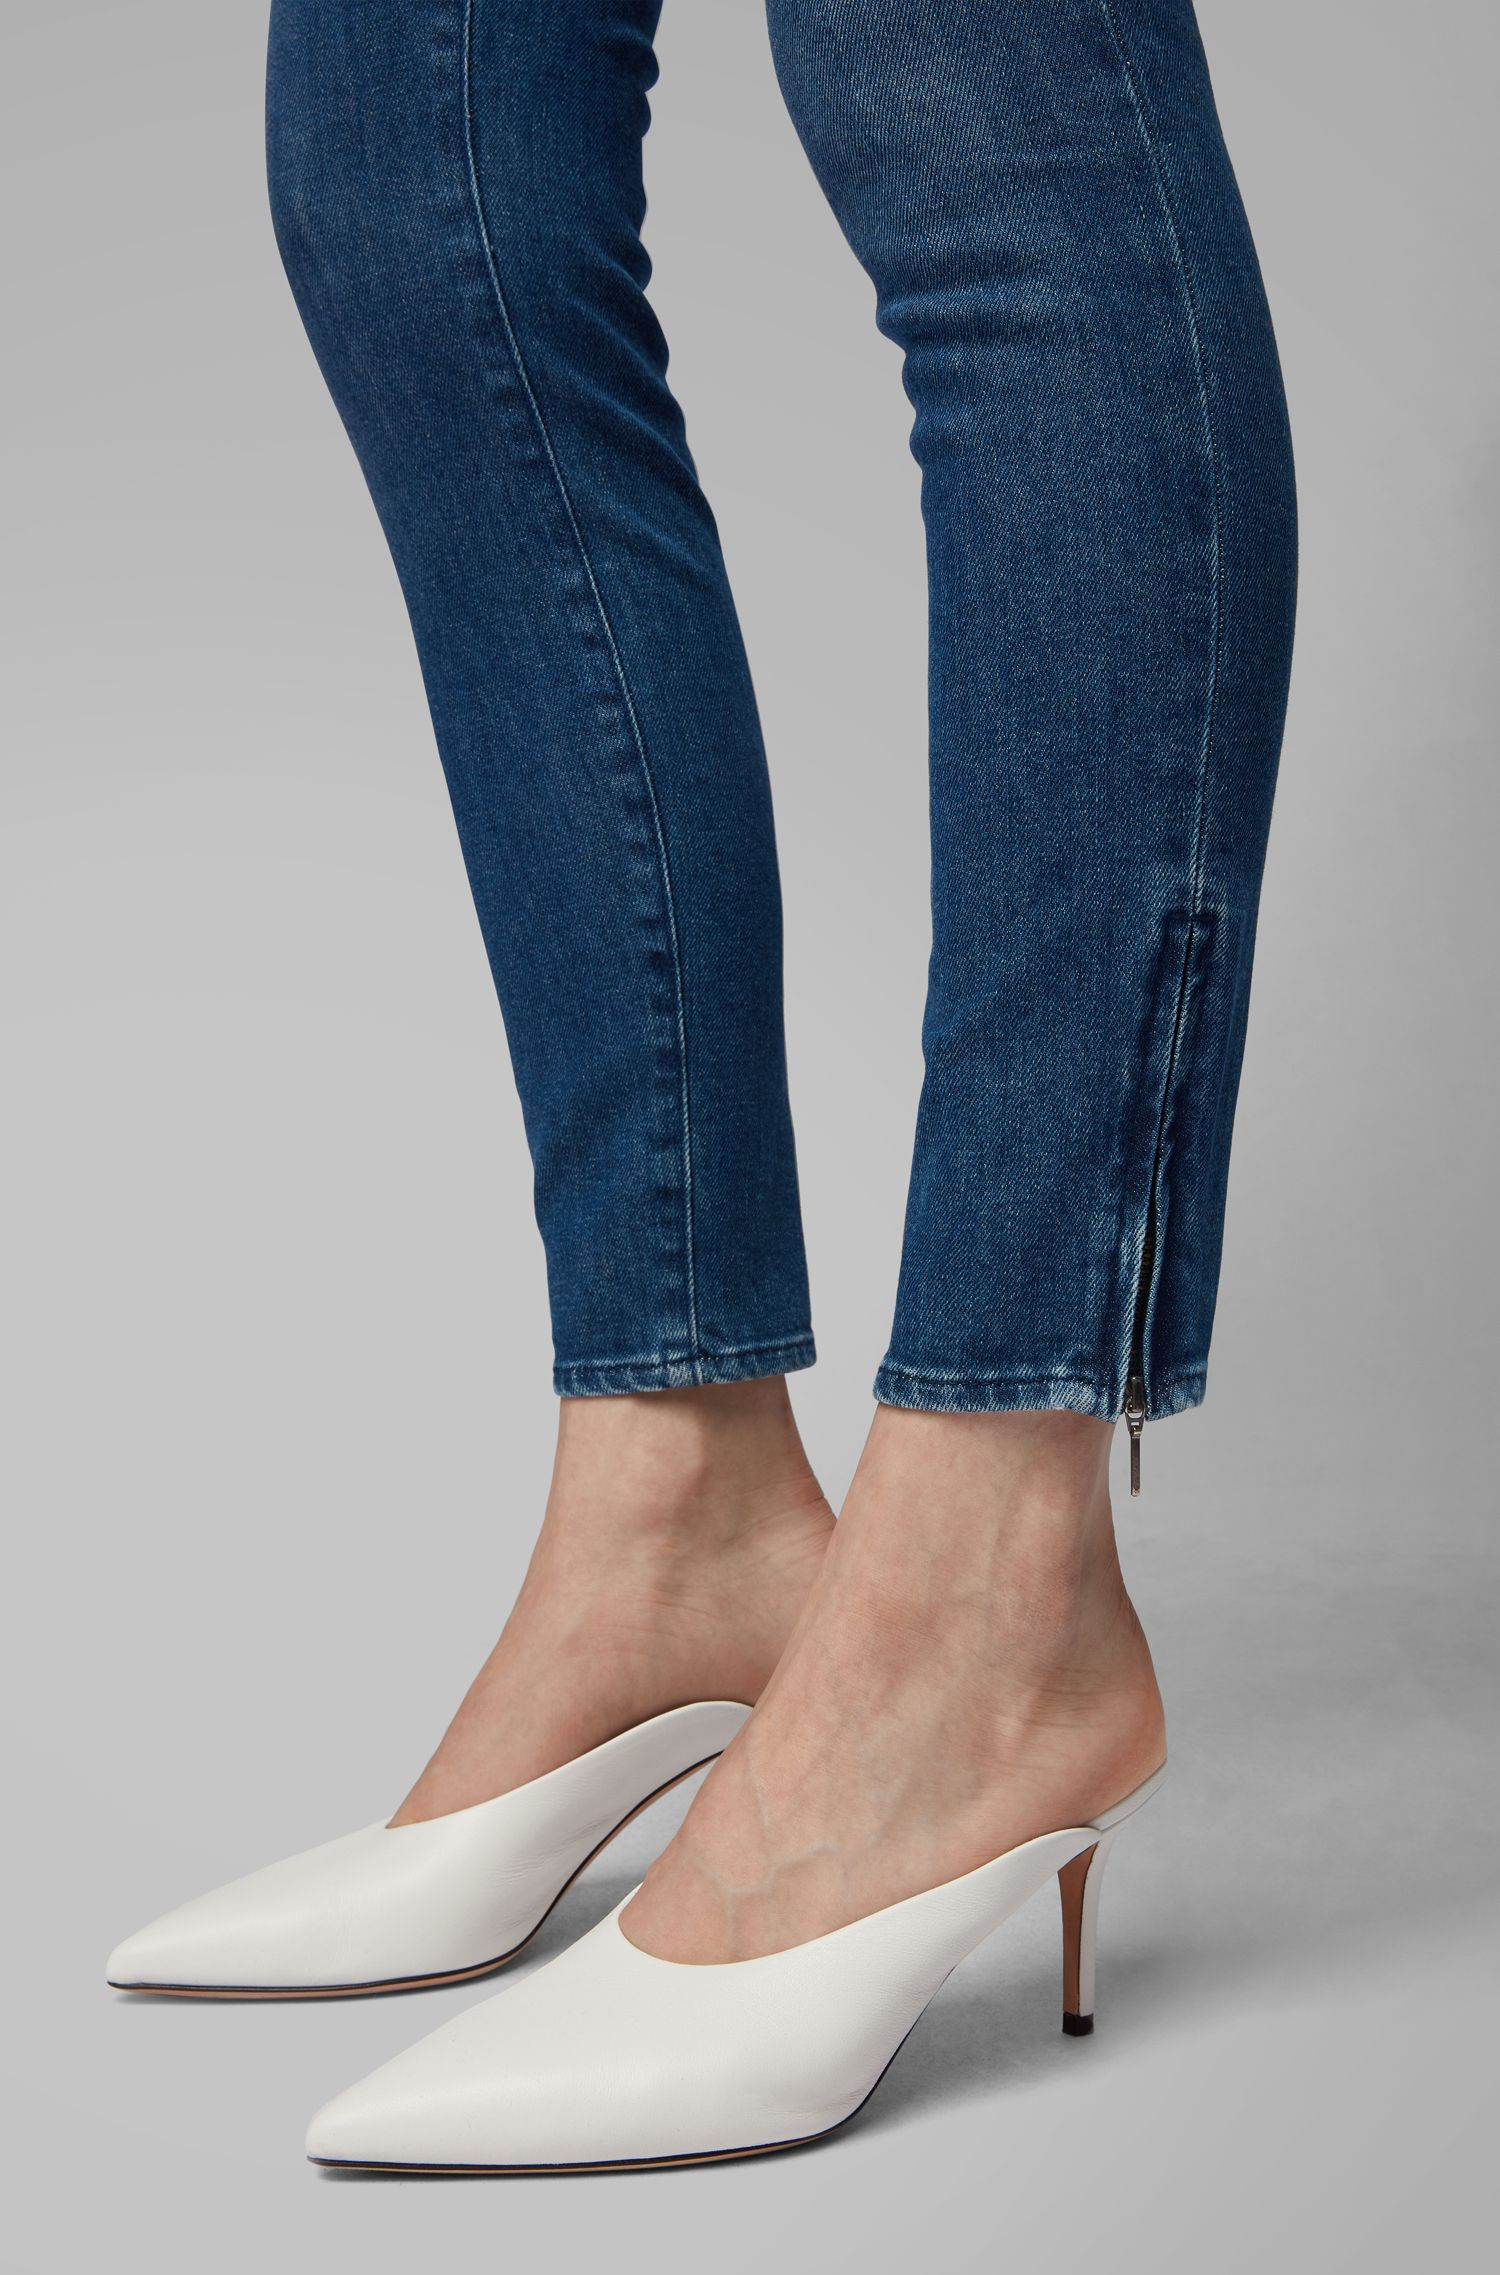 Hugo Boss - Skinny-Fit Jeans aus komfortablem Stretch-Denim - 3